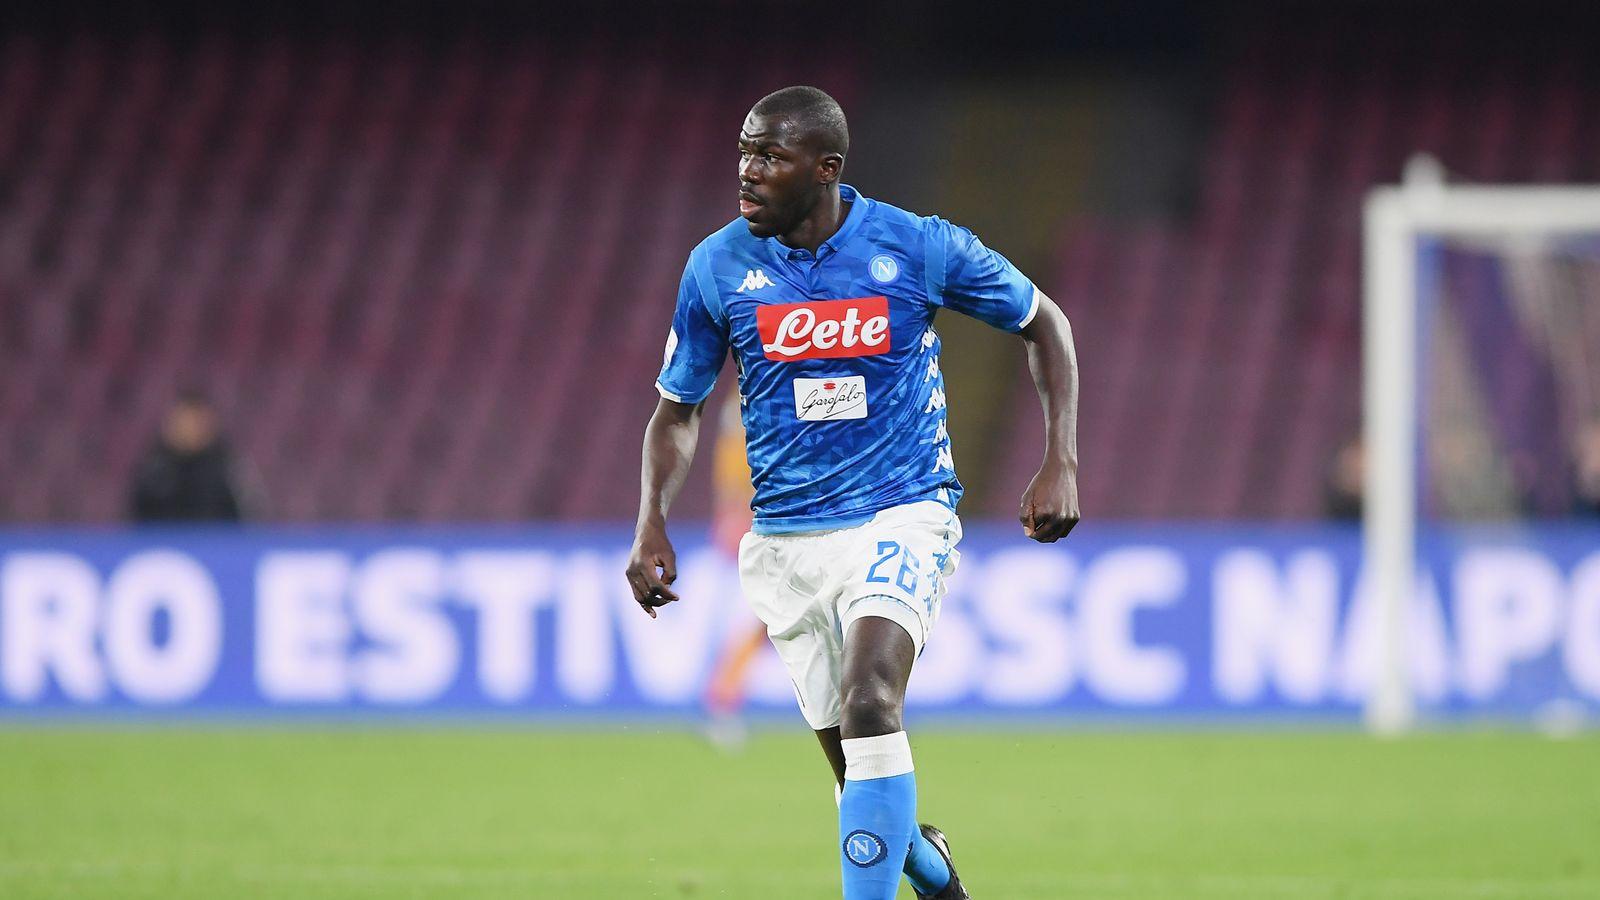 Euro Papers: Man Utd launch £84m bid for Napoli defender